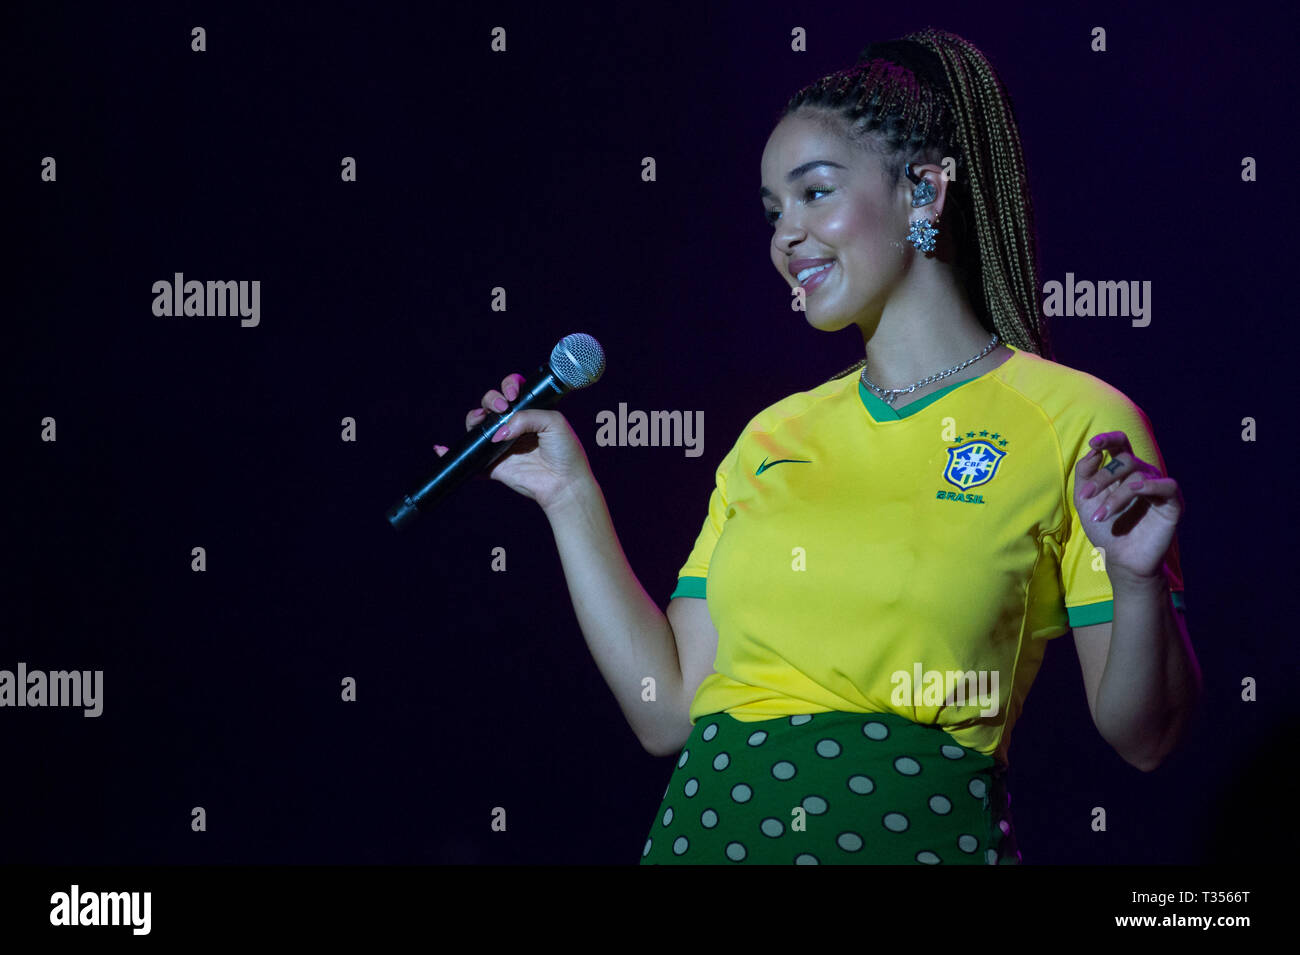 Sao Paulo, Brazil. 06th Apr, 2019. Jorja Smith performs at the Lollapalooza 2019 festival, held at the Autodromo de Interlagos in São Paulo this Saturday, 06. (PHOTO: LEVI BIANCO/BRAZIL PHOTO PRESS) Credit: Brazil Photo Press/Alamy Live News - Stock Image